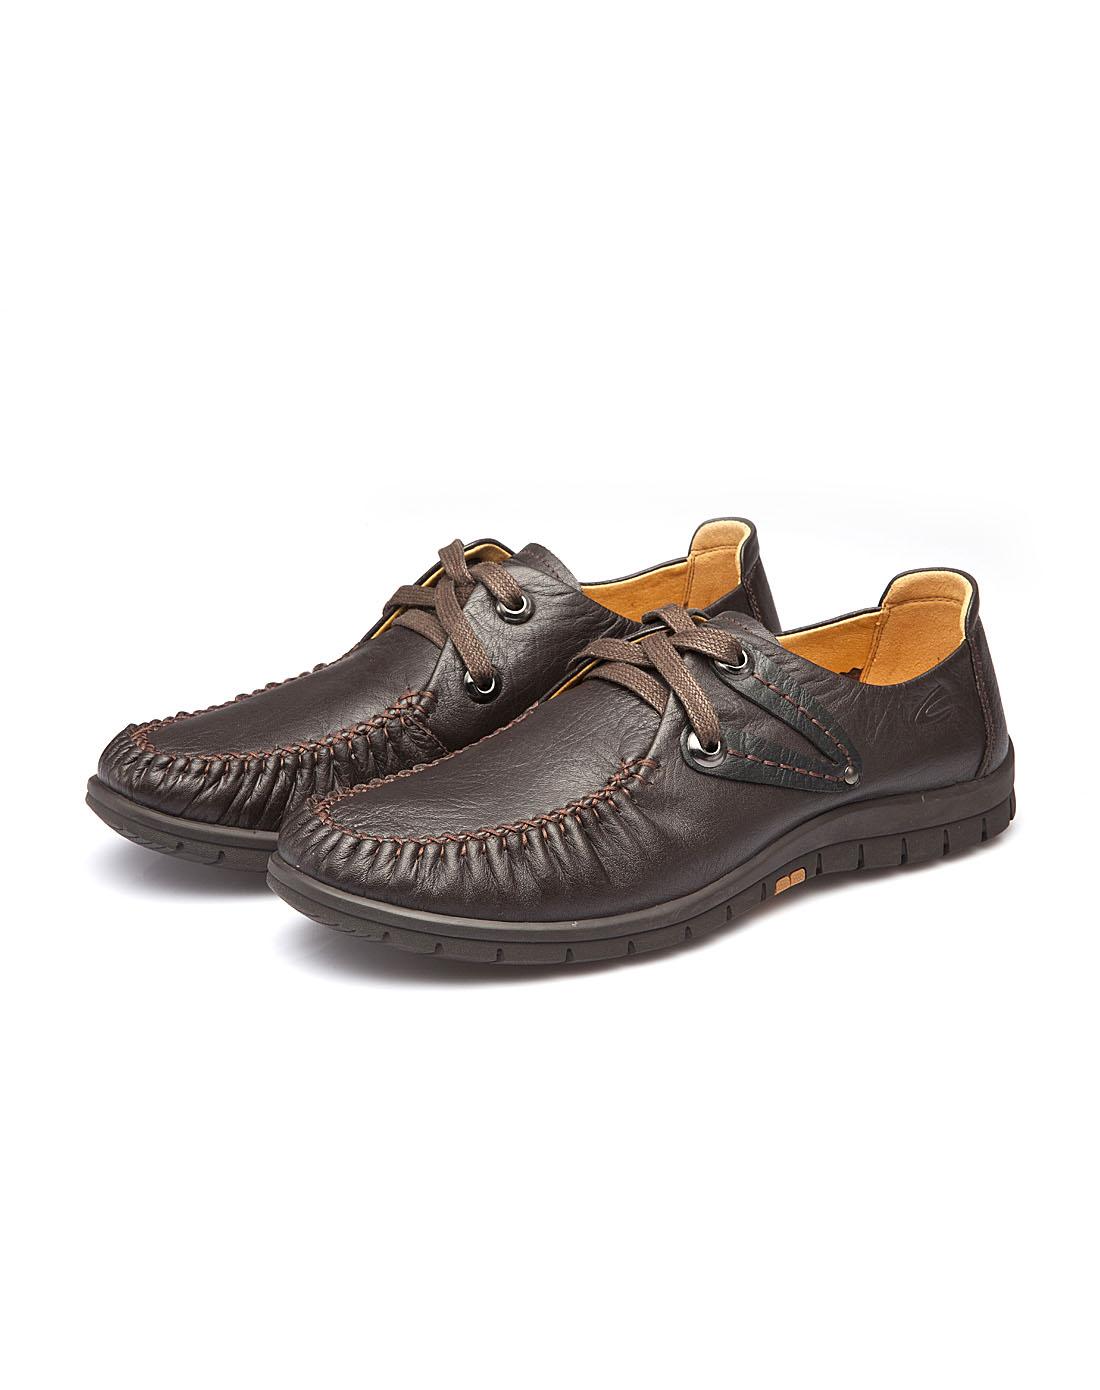 active棕色牛皮休闲单鞋c6350615602